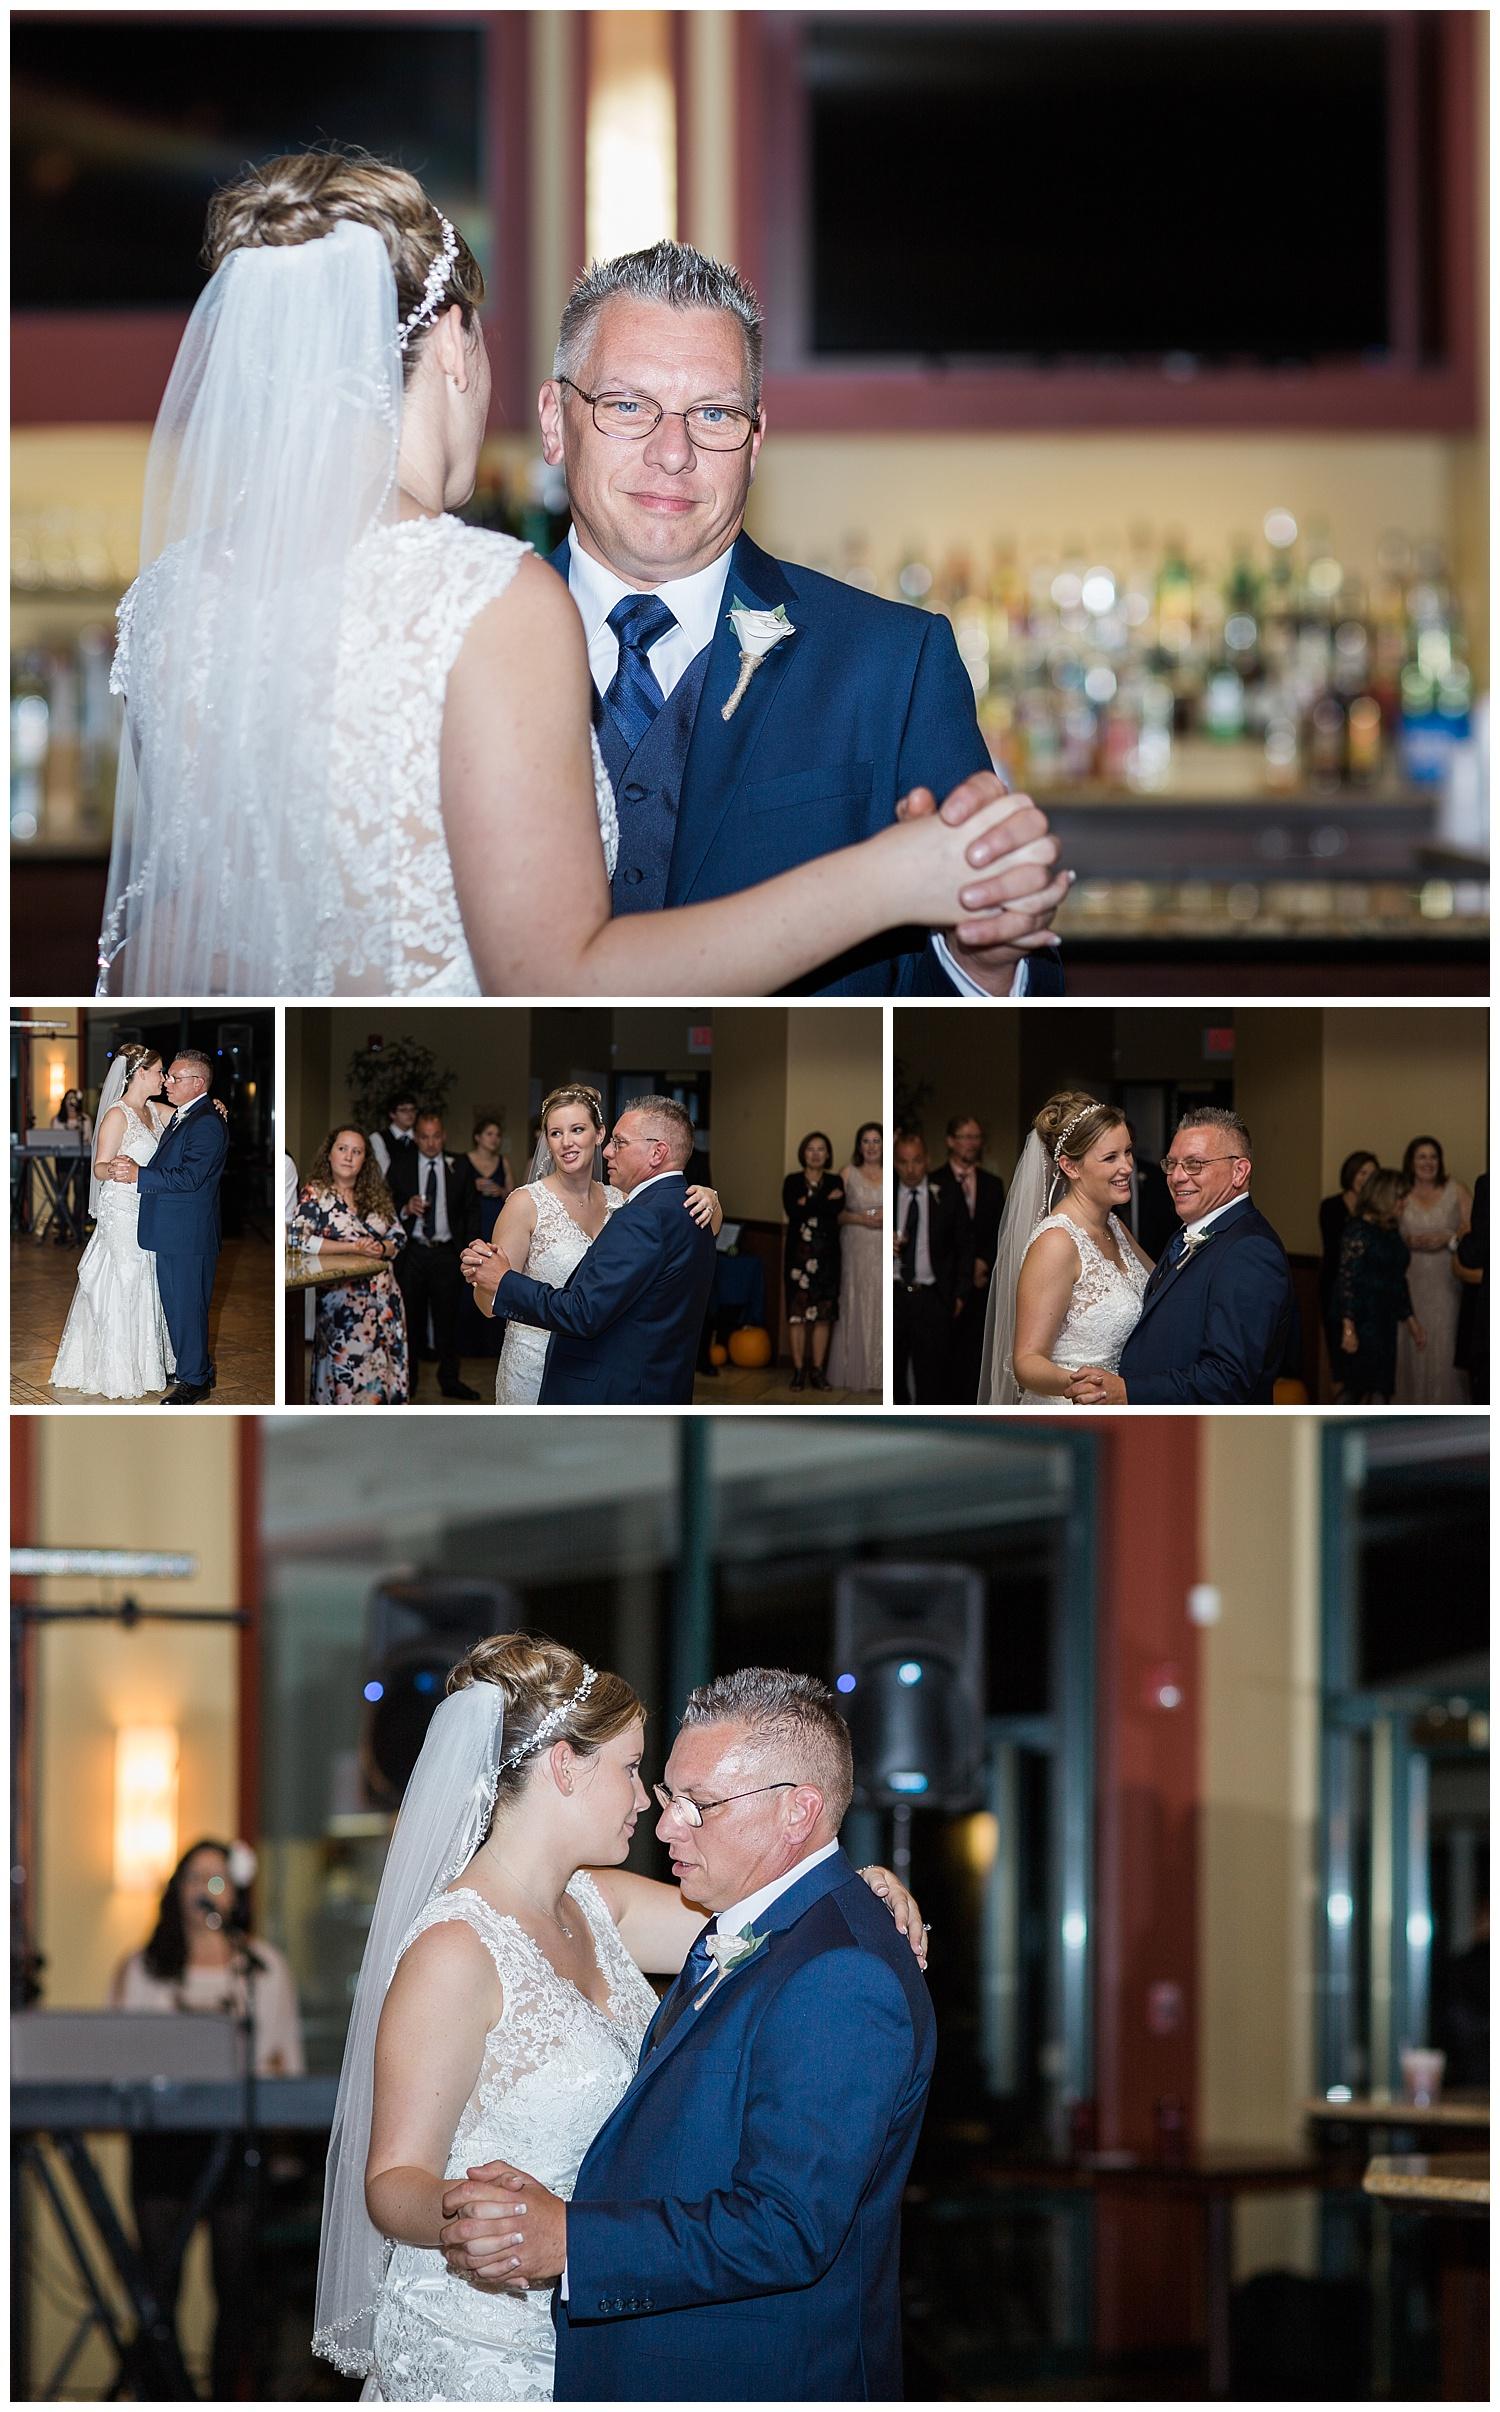 Jessica and Scott McKay - Terry Hills Golf Course - Batavia NY - Lass and Beau-1147_Buffalo wedding photography.jpg